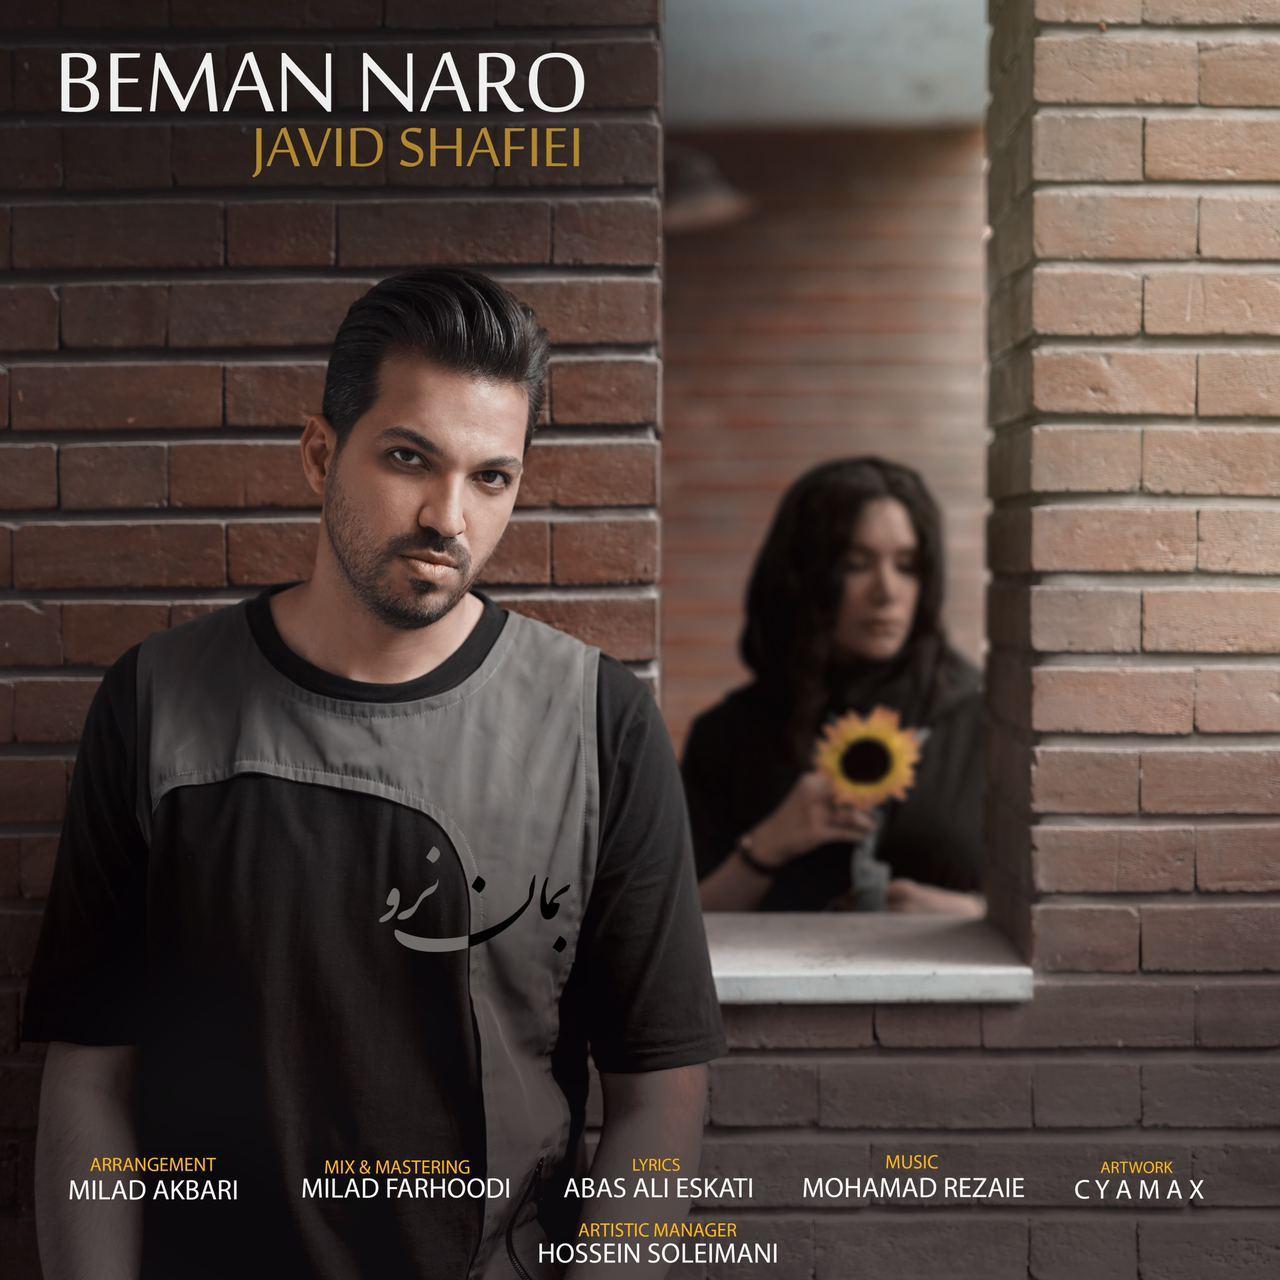 Javid Shafiei – Beman Naro